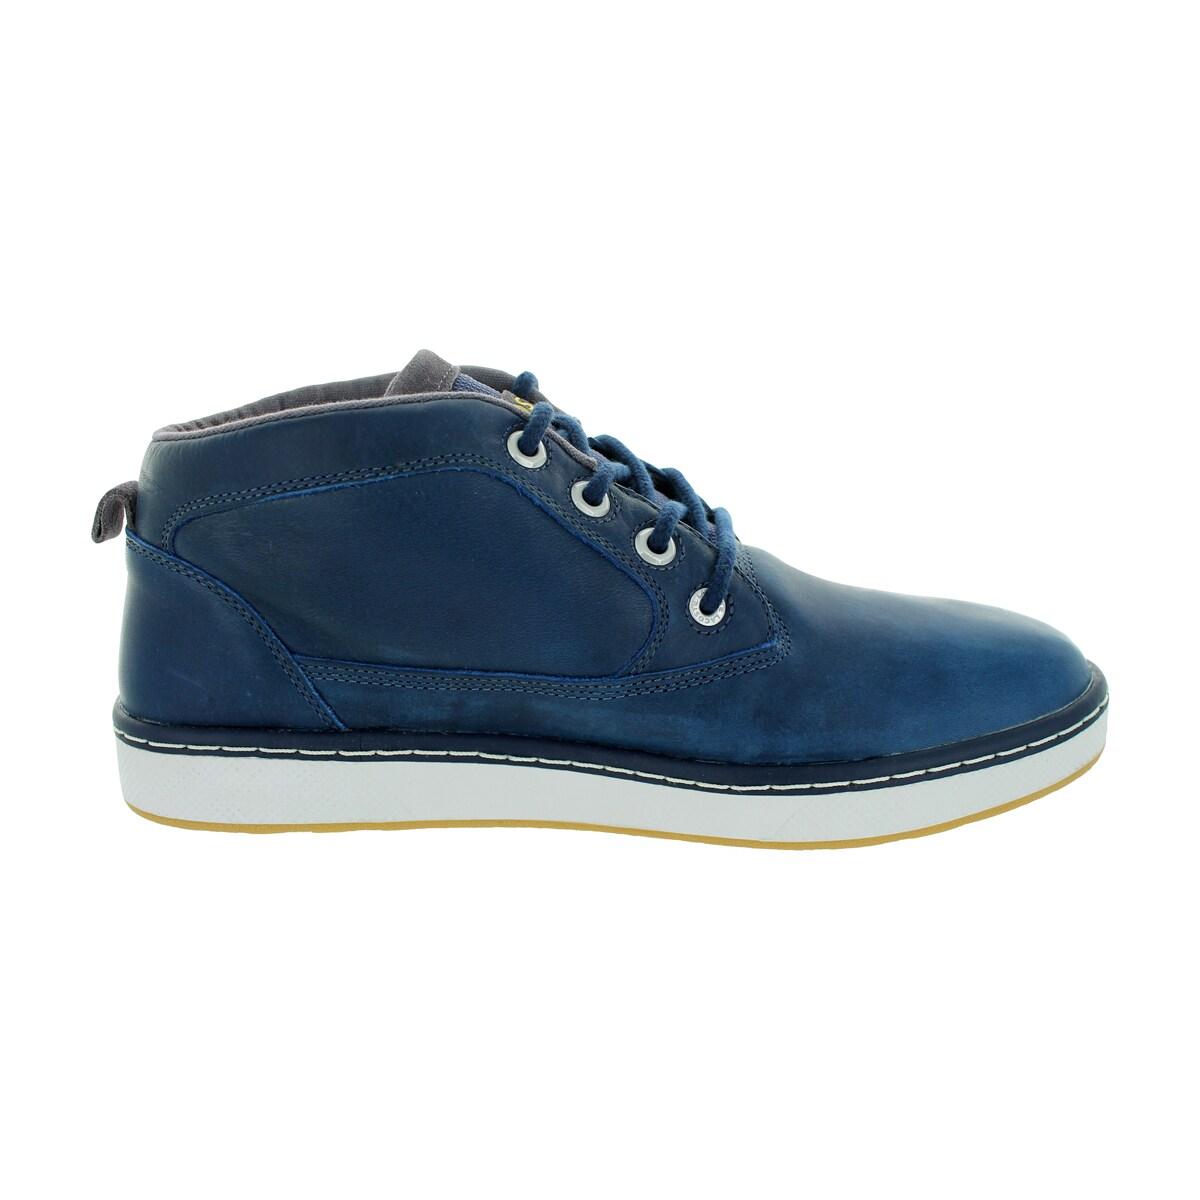 af371c857 Lacoste Men s Keston Lms Lem Lth Dark Blue  Casual Shoe - Free Shipping  Today - Overstock - 19151357